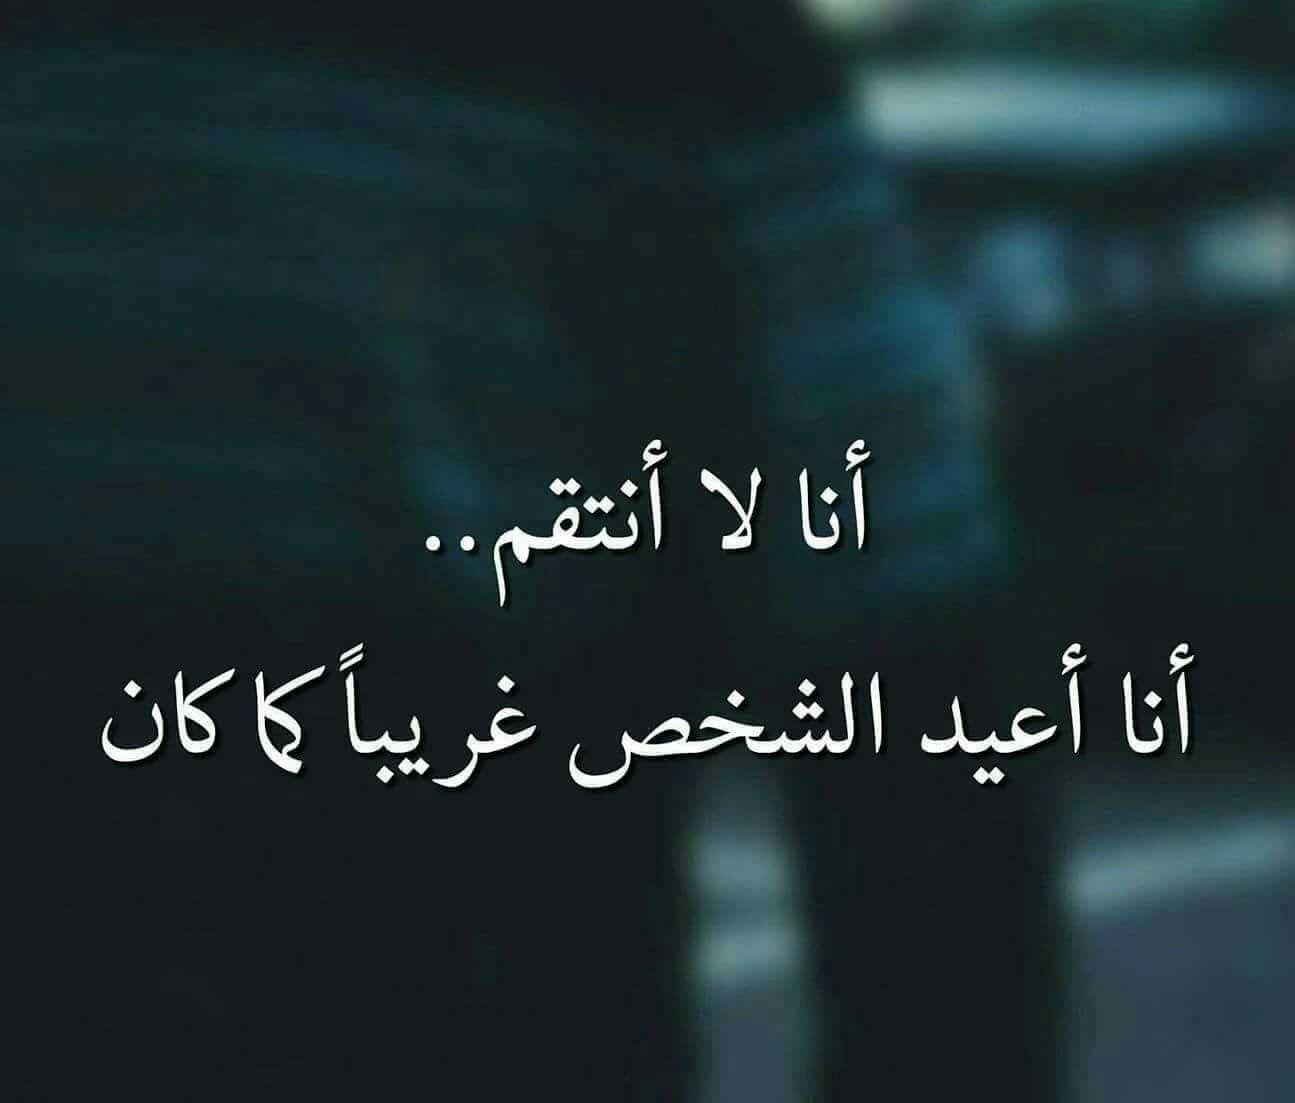 عزة نفس Arabic Quotes Cool Words Beautiful Quotes